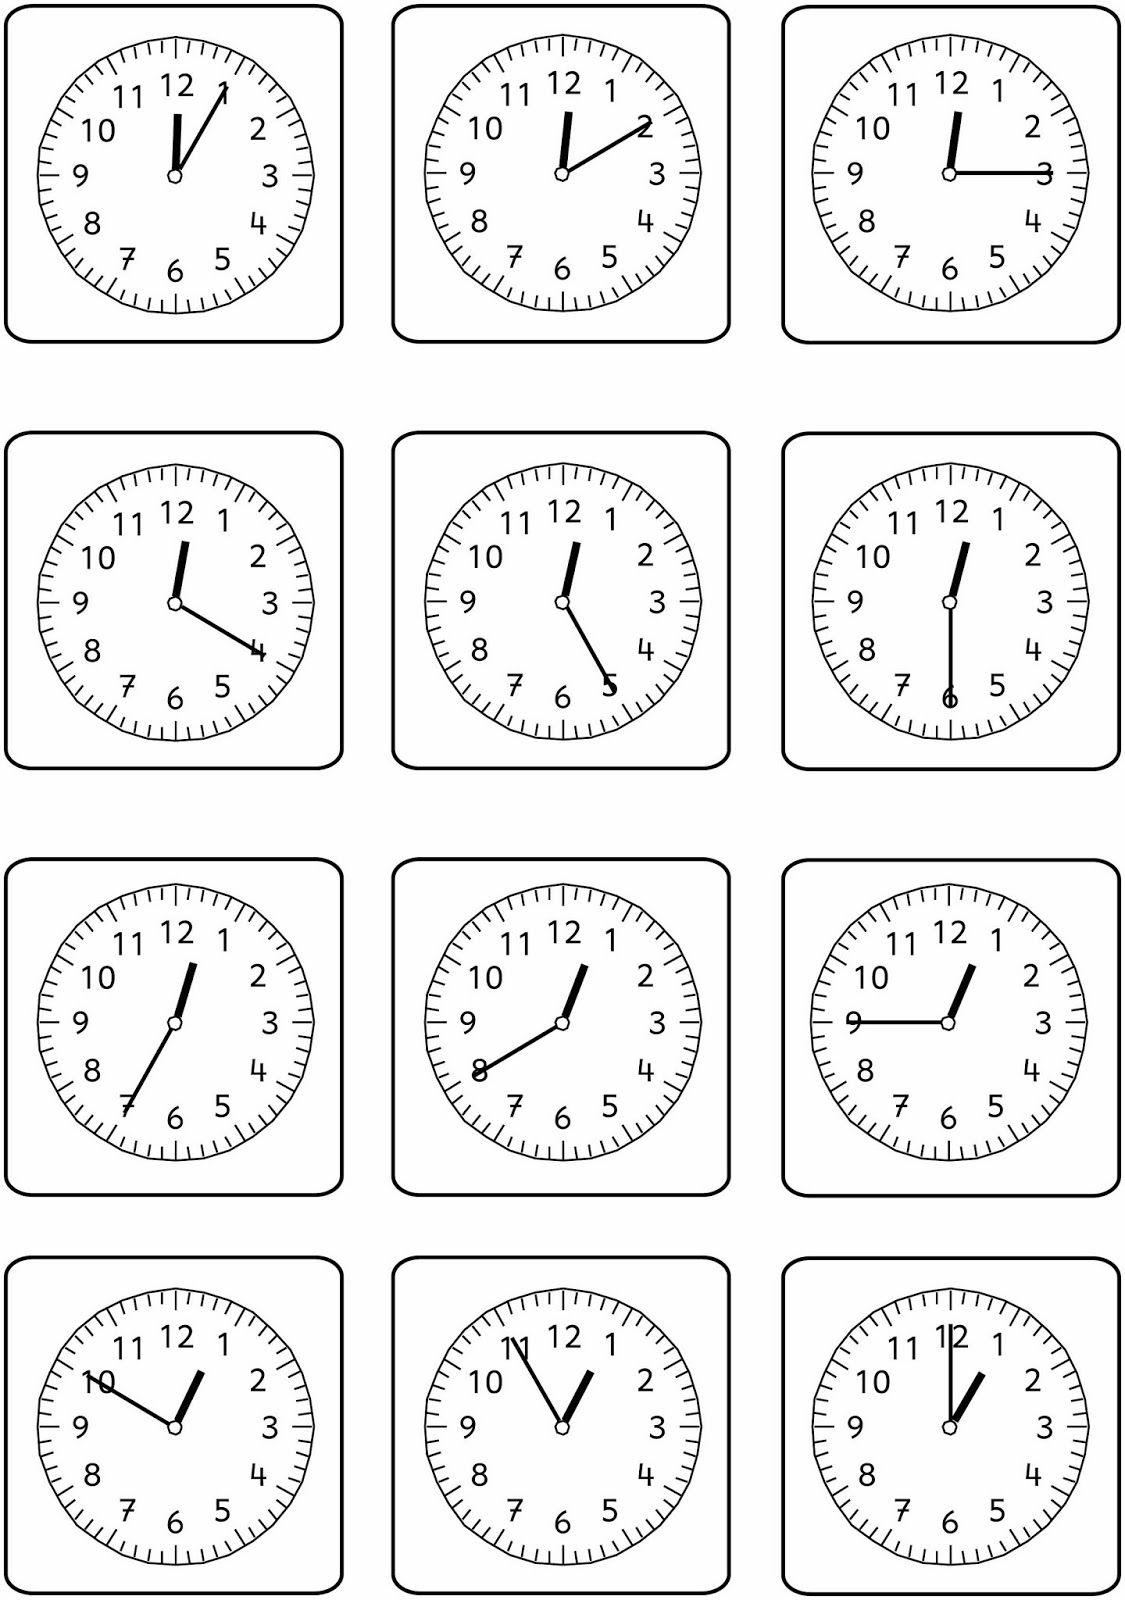 uhrenblitzblick clock uhrzeit grundschule mathe uhr a mathematikunterricht. Black Bedroom Furniture Sets. Home Design Ideas